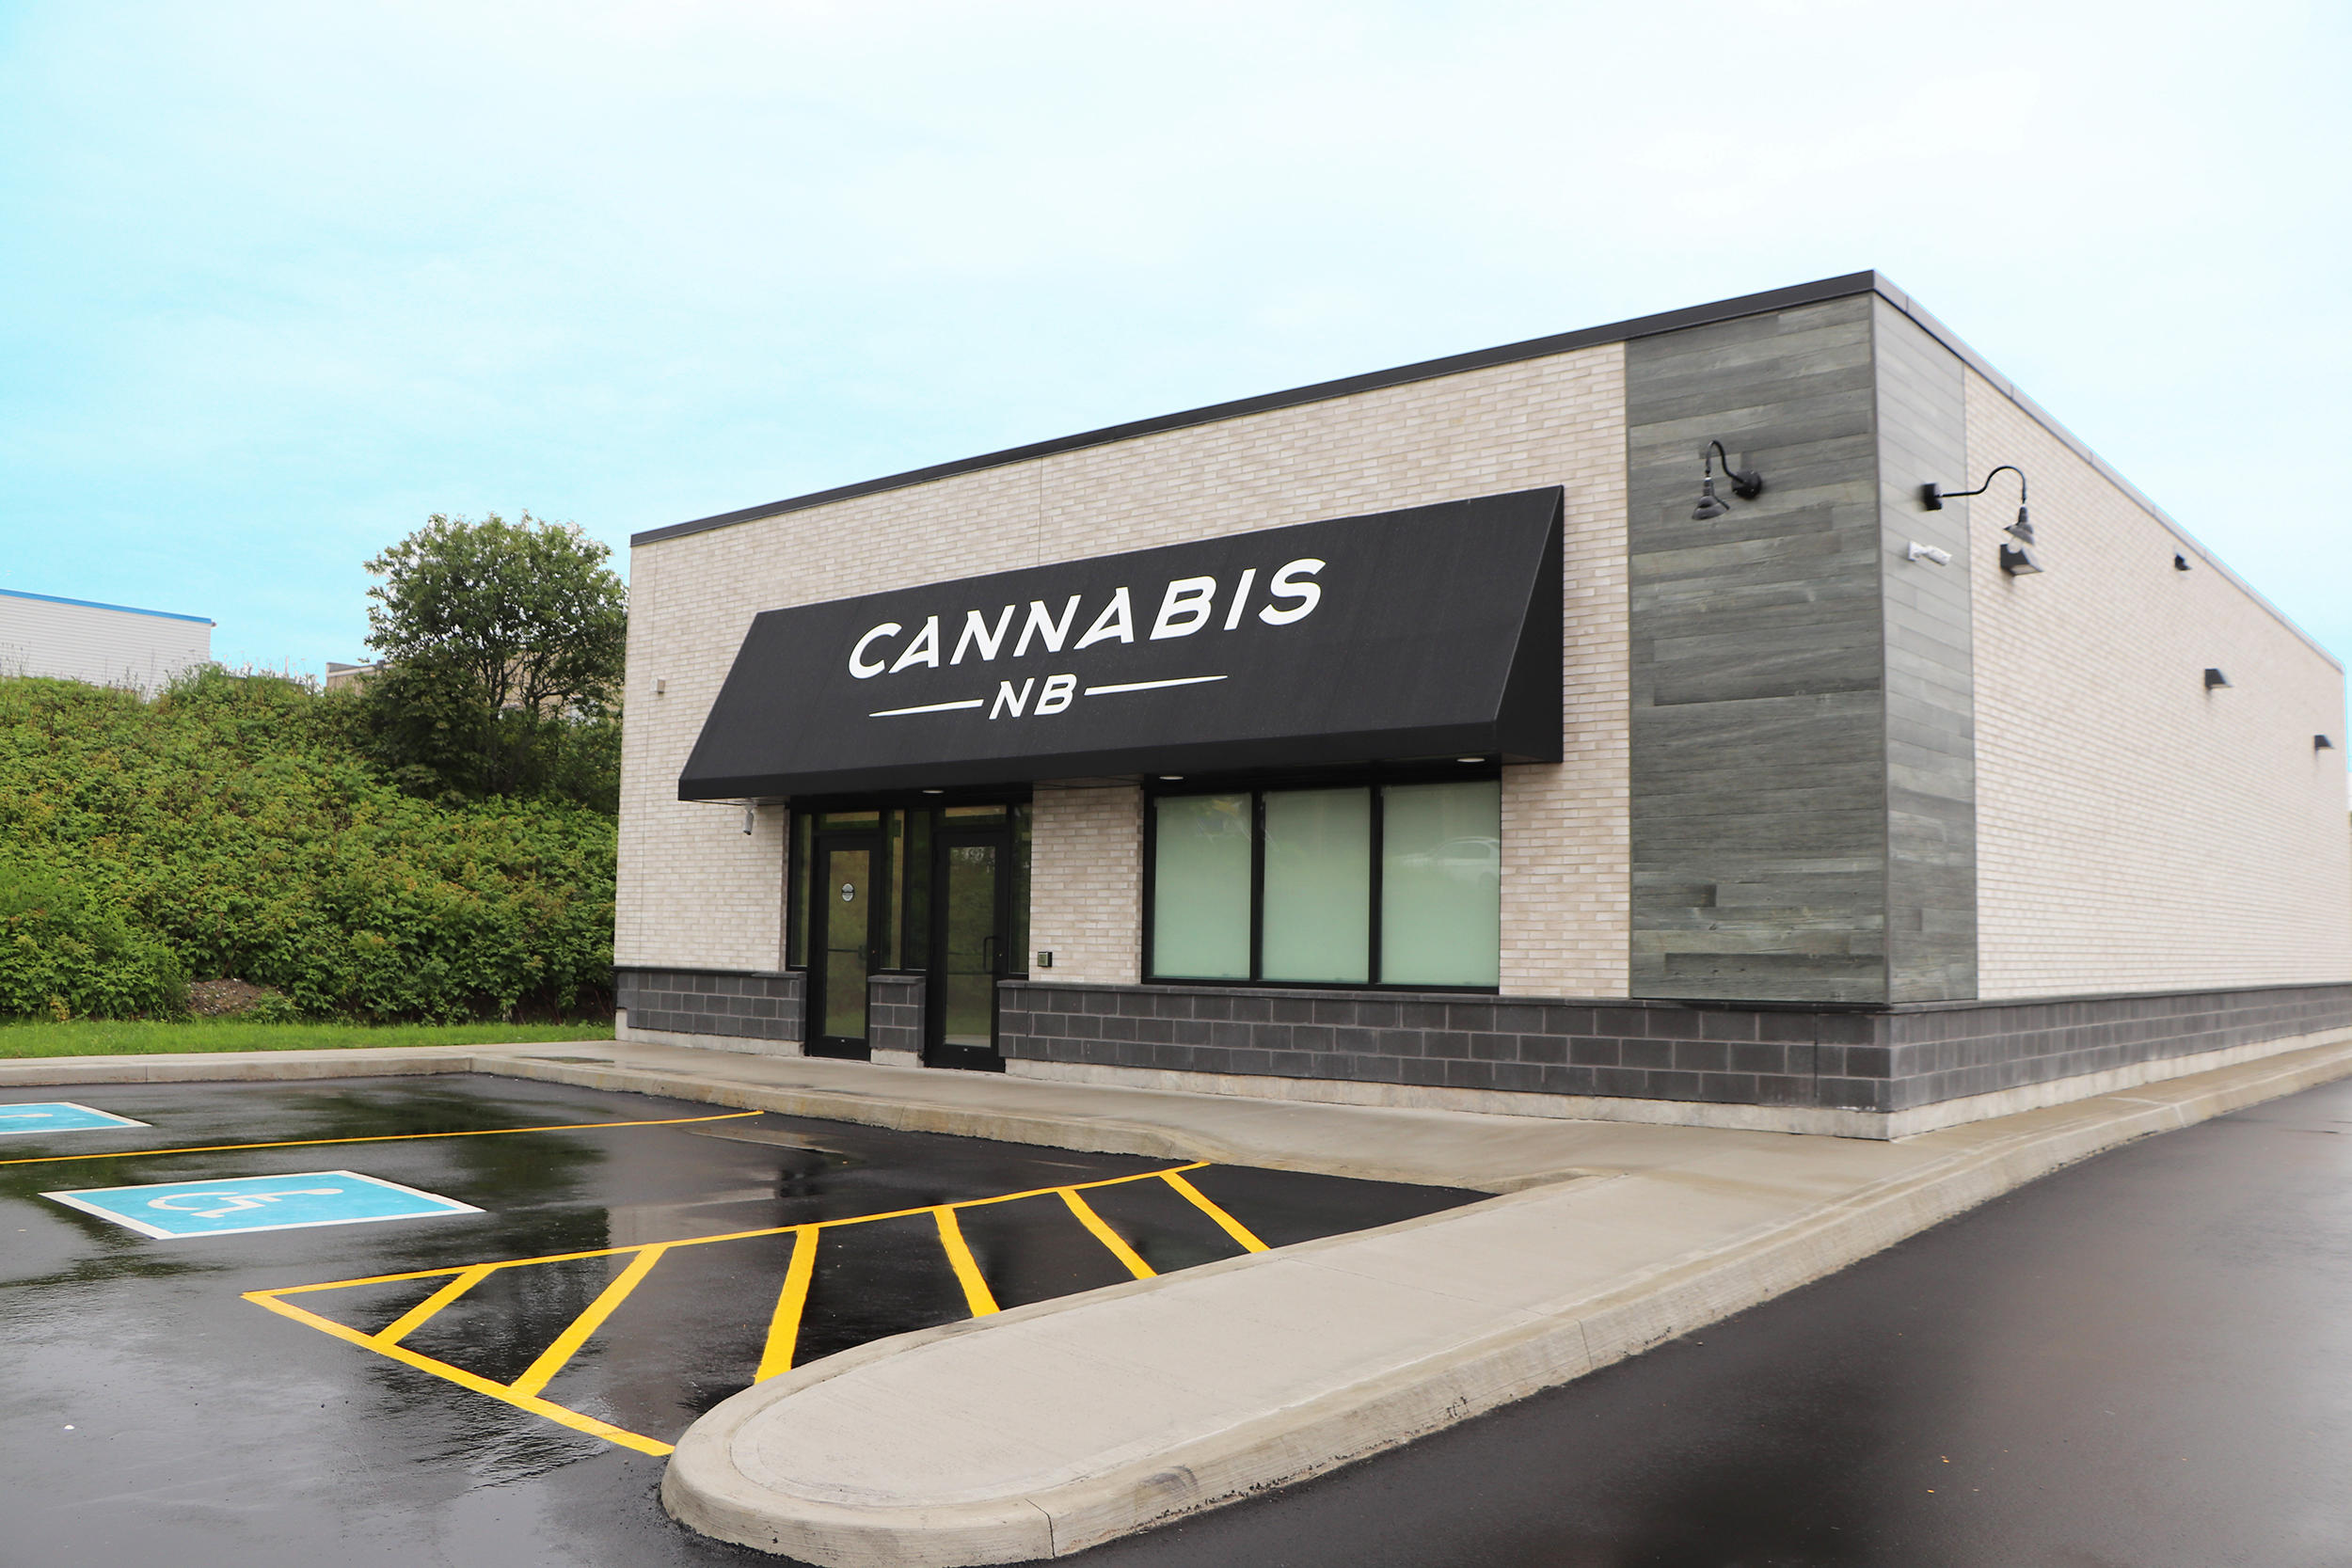 Cannabis NB Saint John location on Lansdowne Ave Cannabis NB Sussex (833)821-2195